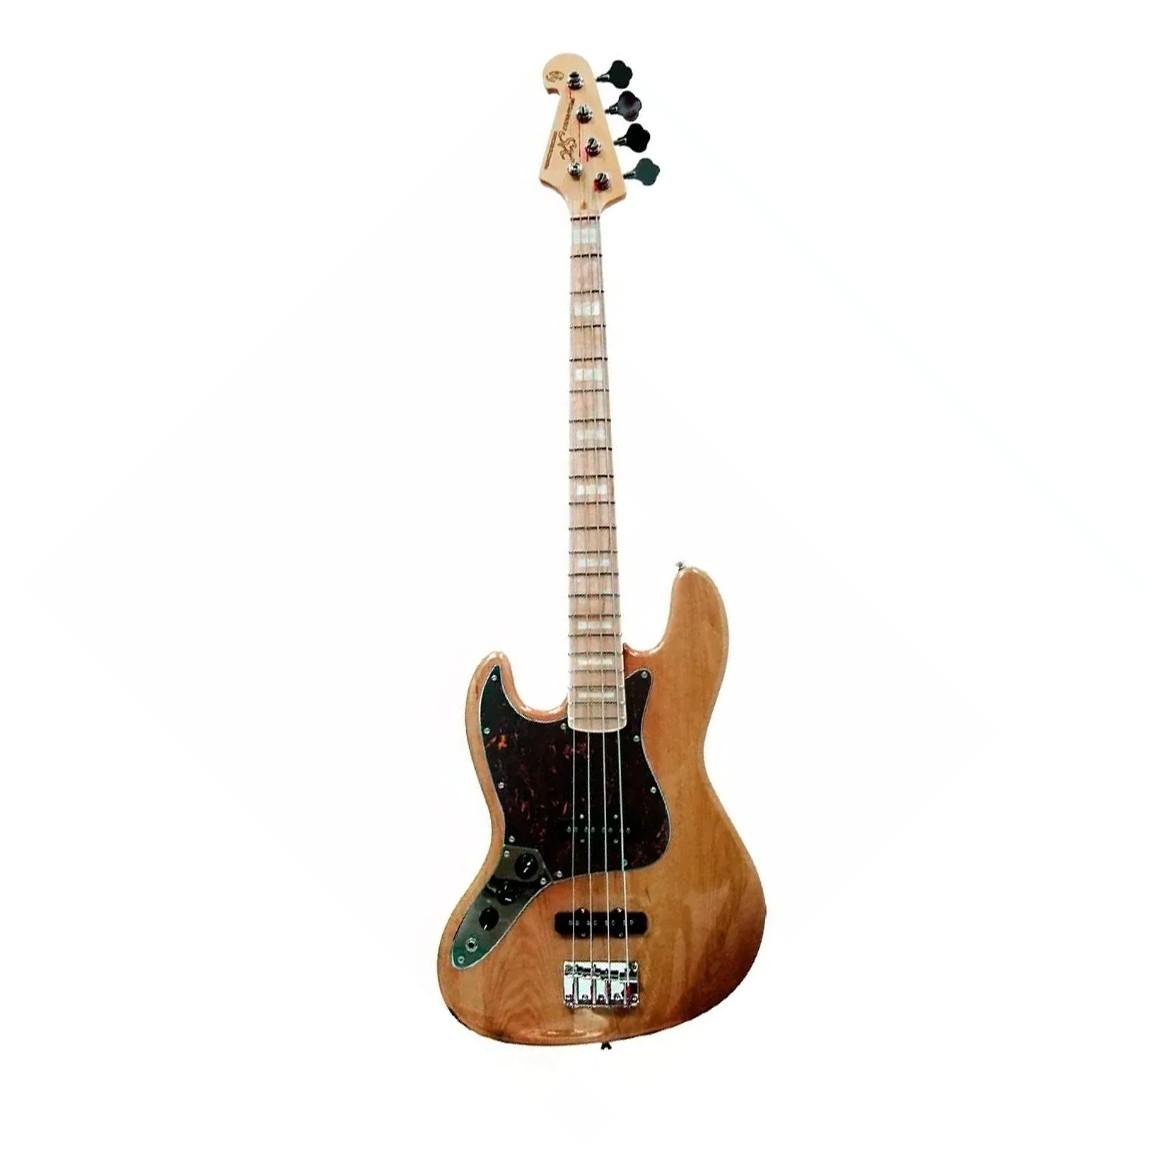 Contra Baixo Canhoto Sx Sjb75 Lh Tortoise Jazz Bass 4 Cordas  - MegaLojaSP